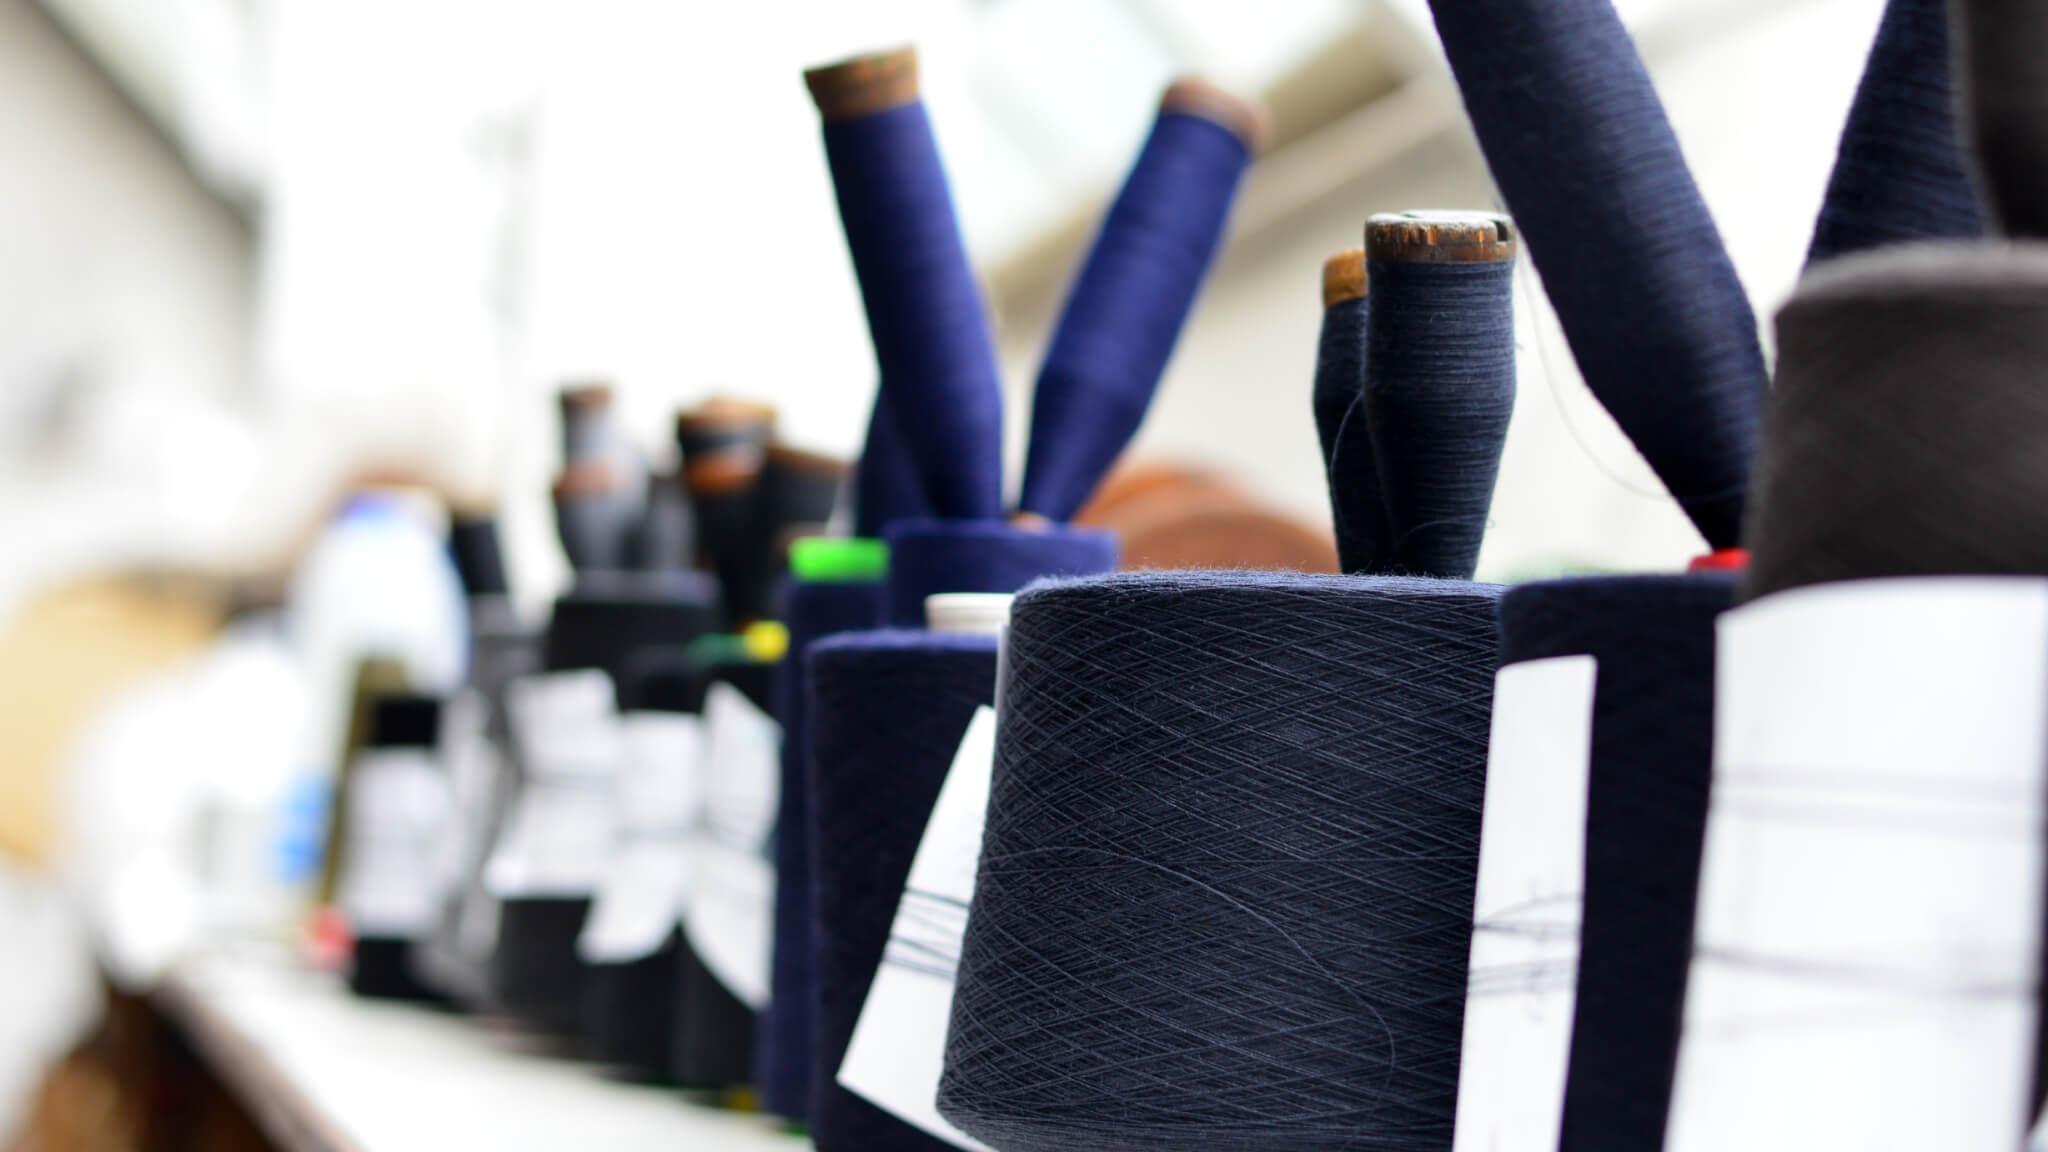 yarn-bespoke-suits-cloth